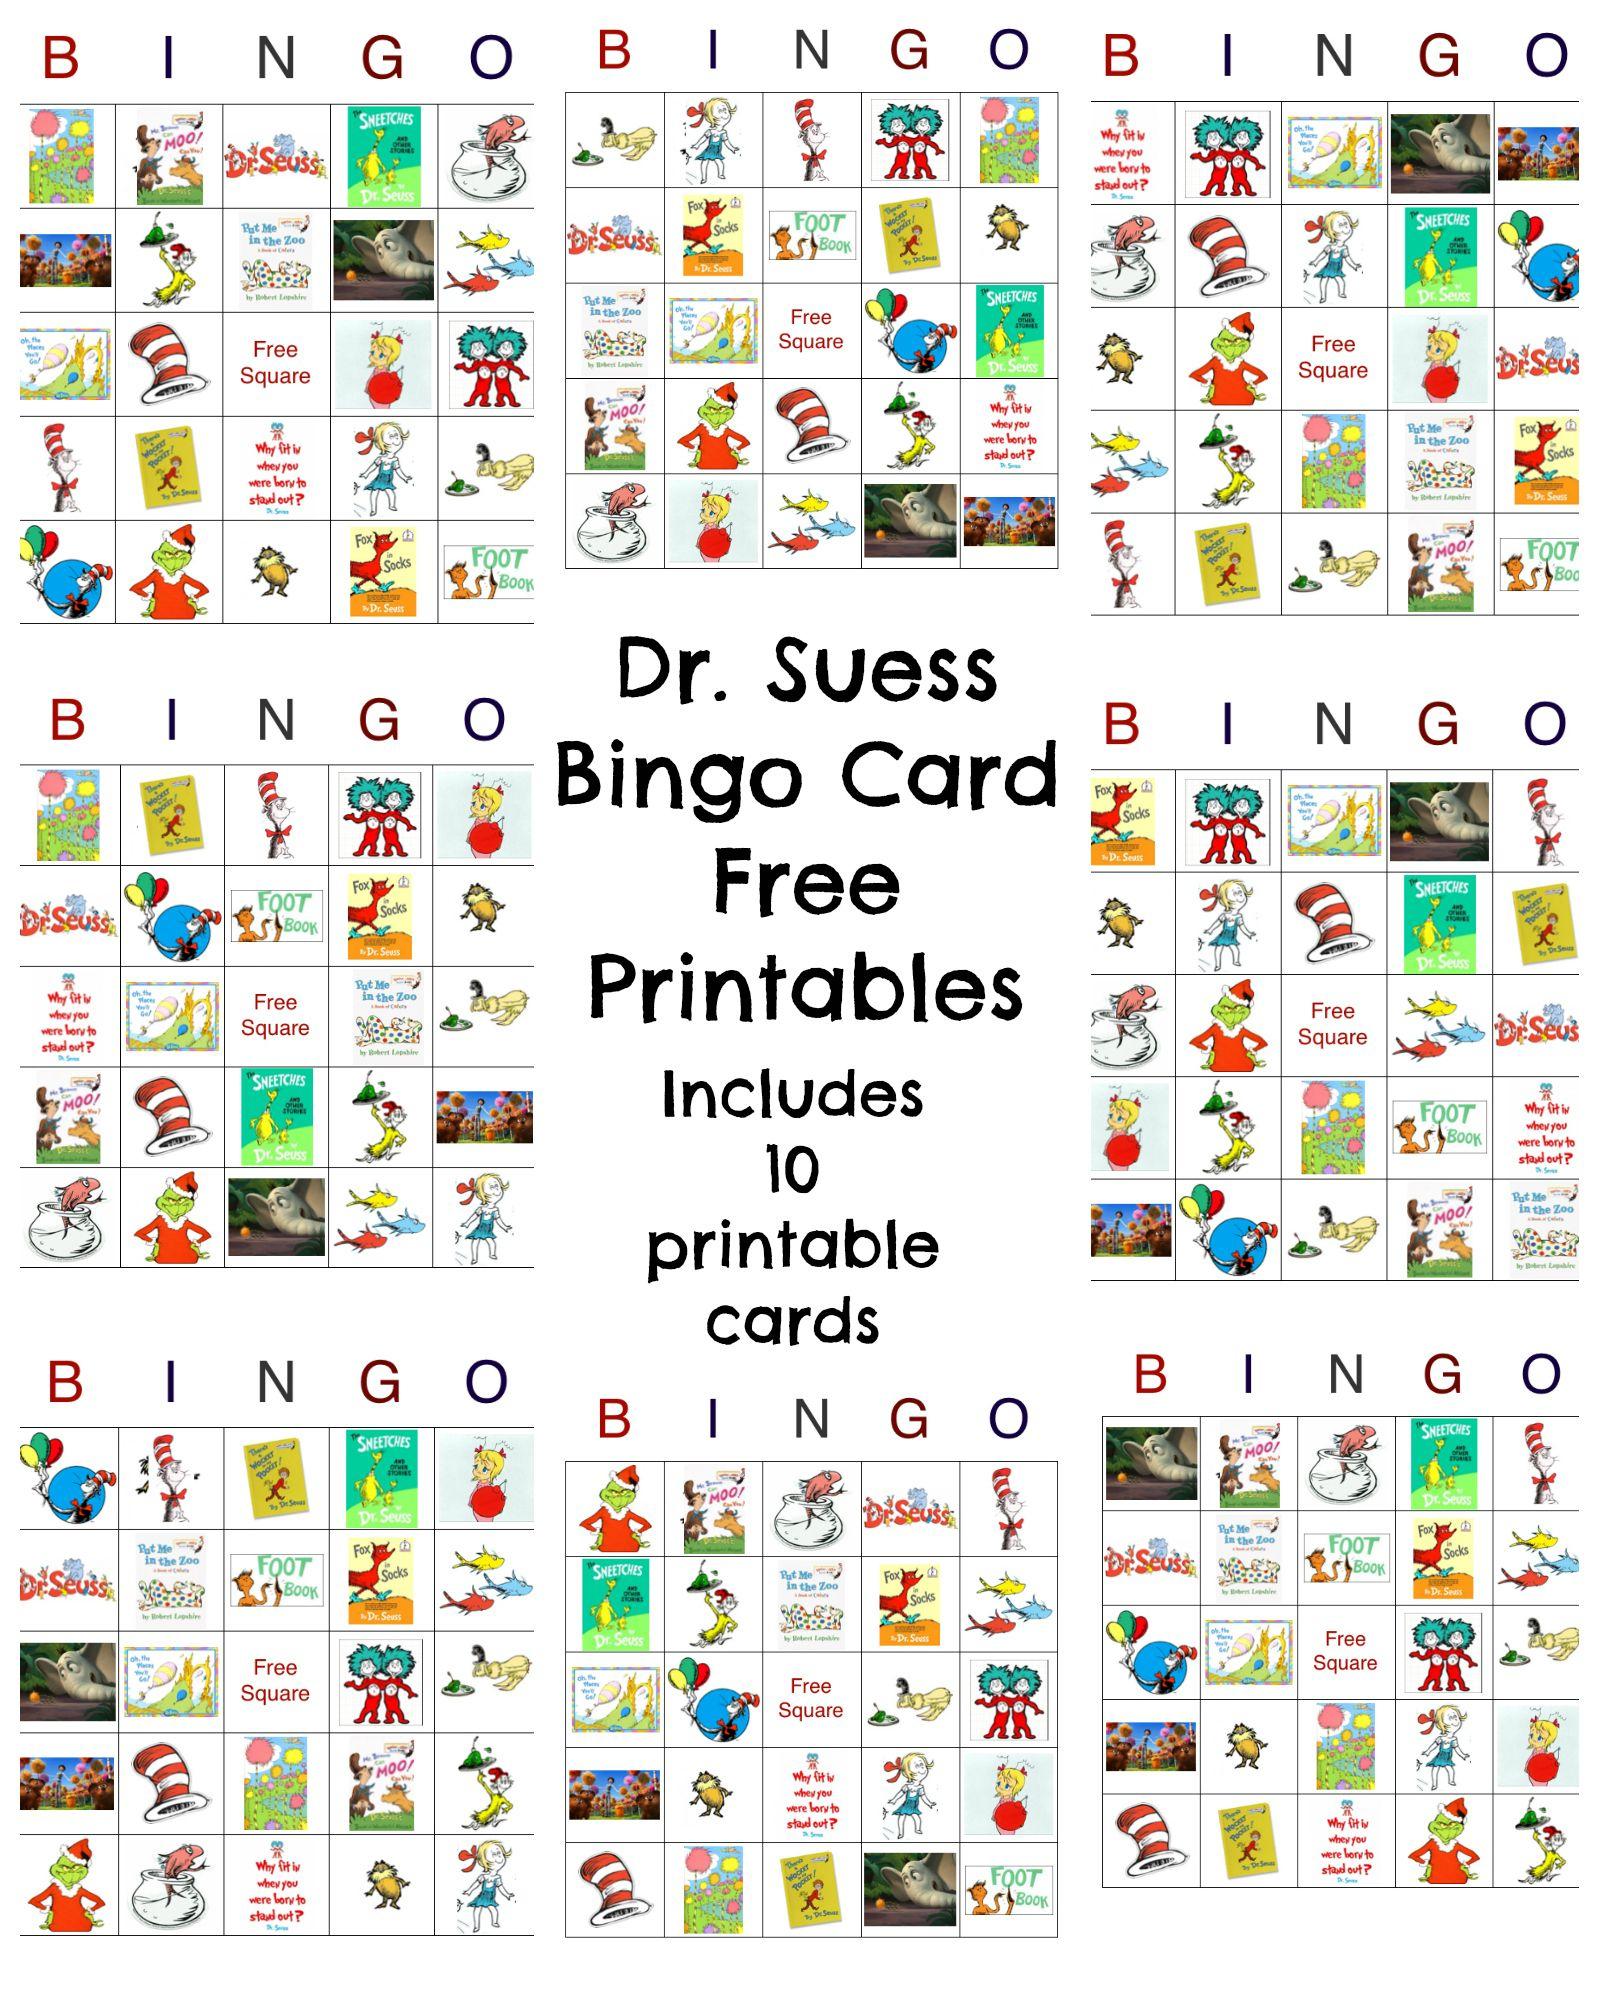 Dr Seuss Bingo Game Free Printable | Dr Seuss Day, Dr Seuss